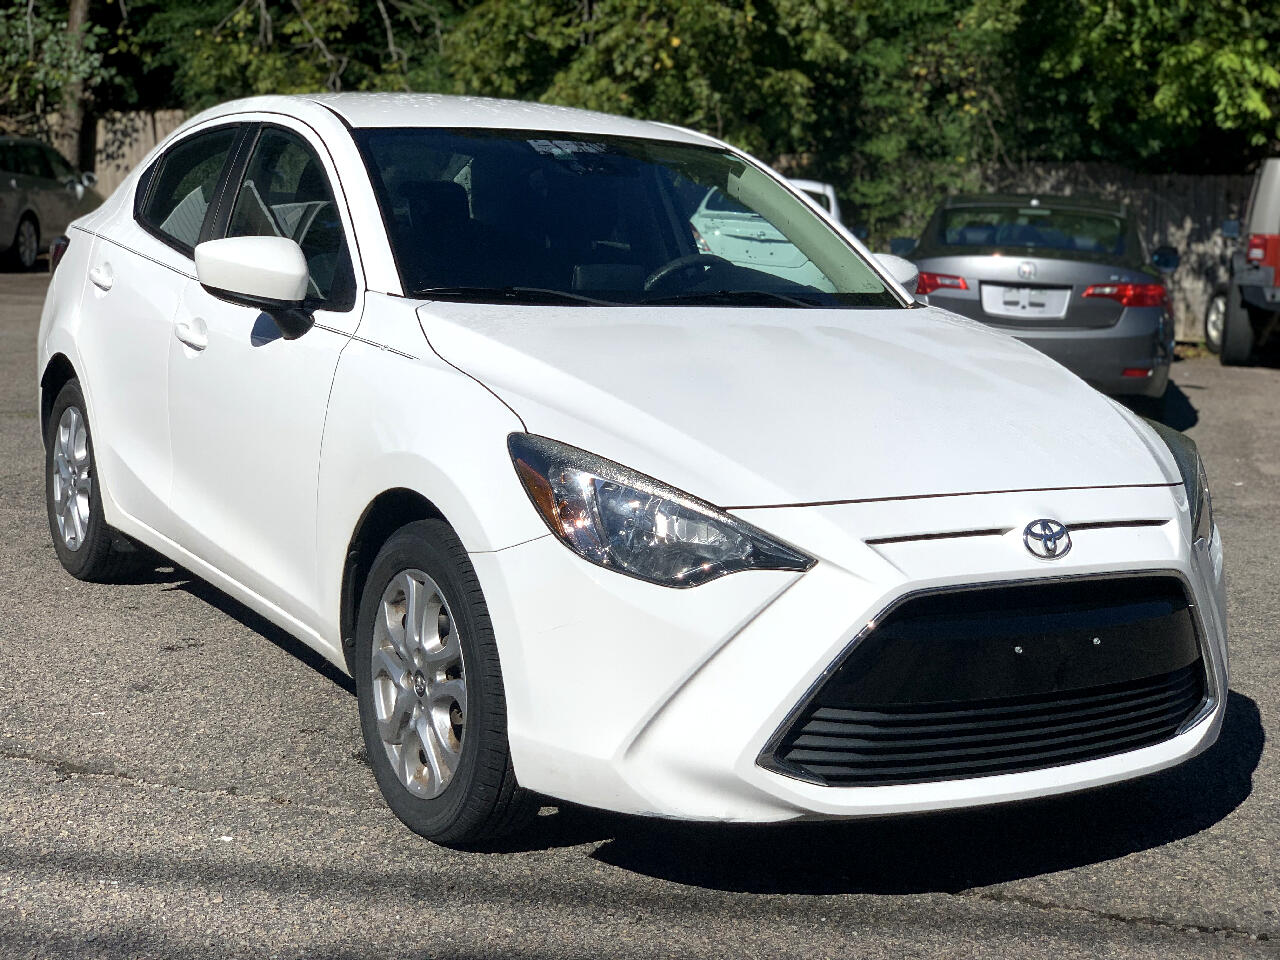 Toyota Yaris iA Auto (Natl) 2018